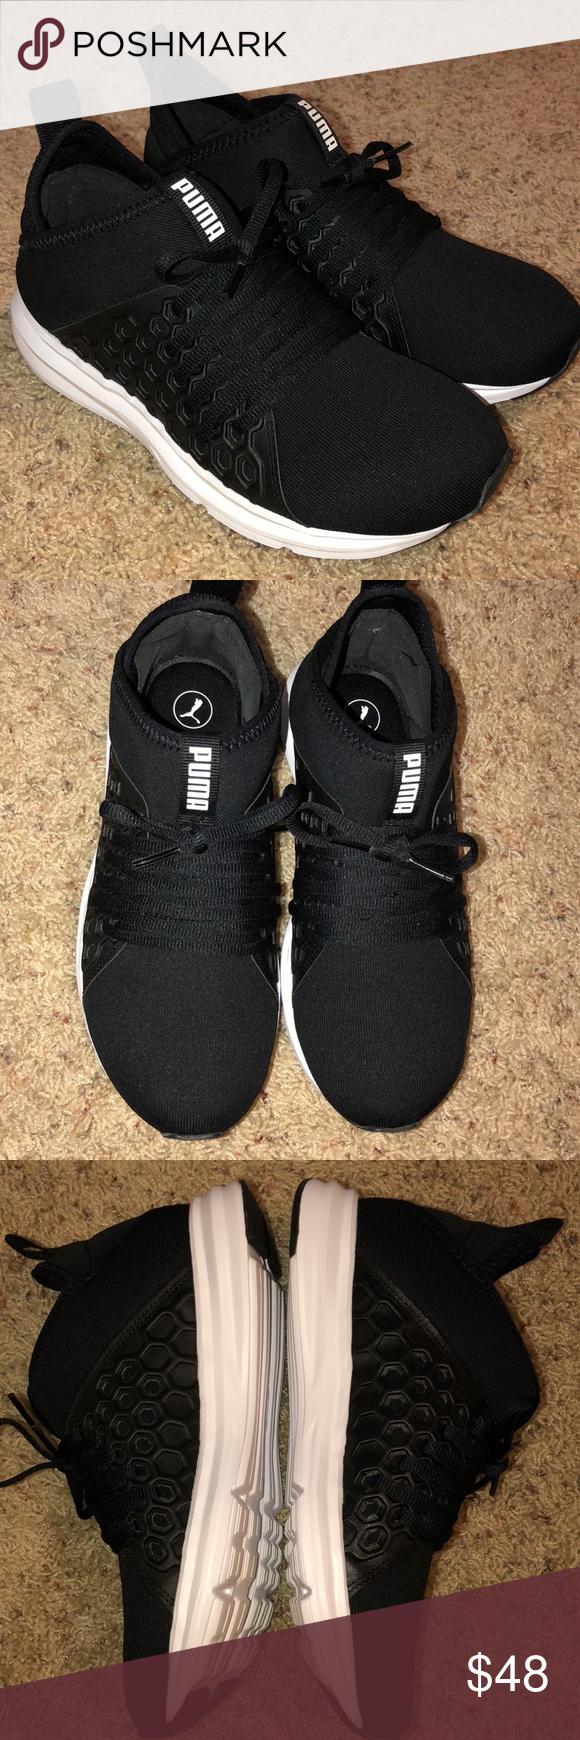 NEW* Puma Soft foam shoes | Foams shoes